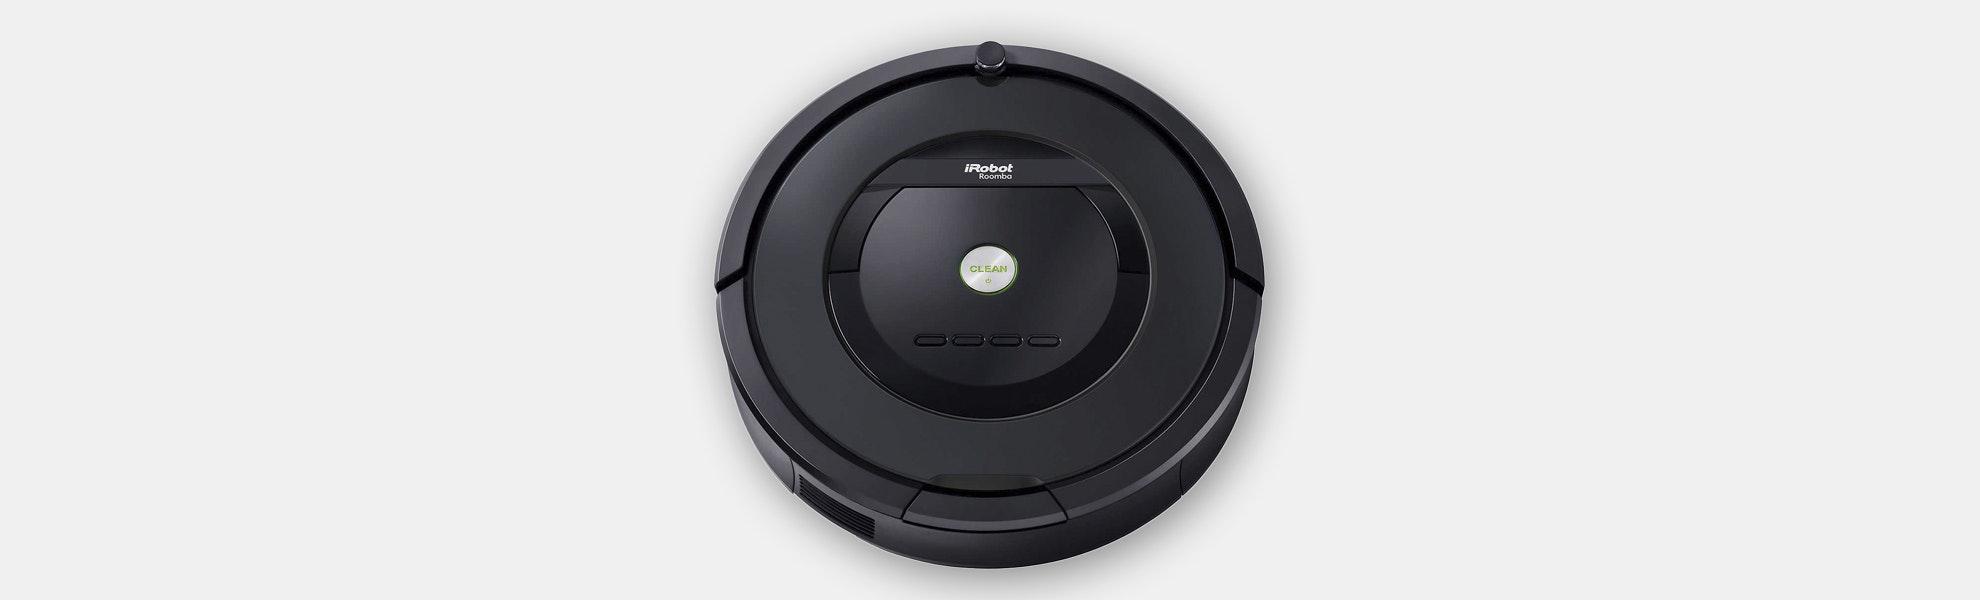 iRobot Roomba 805 Robotic Vacuum (Refurb)